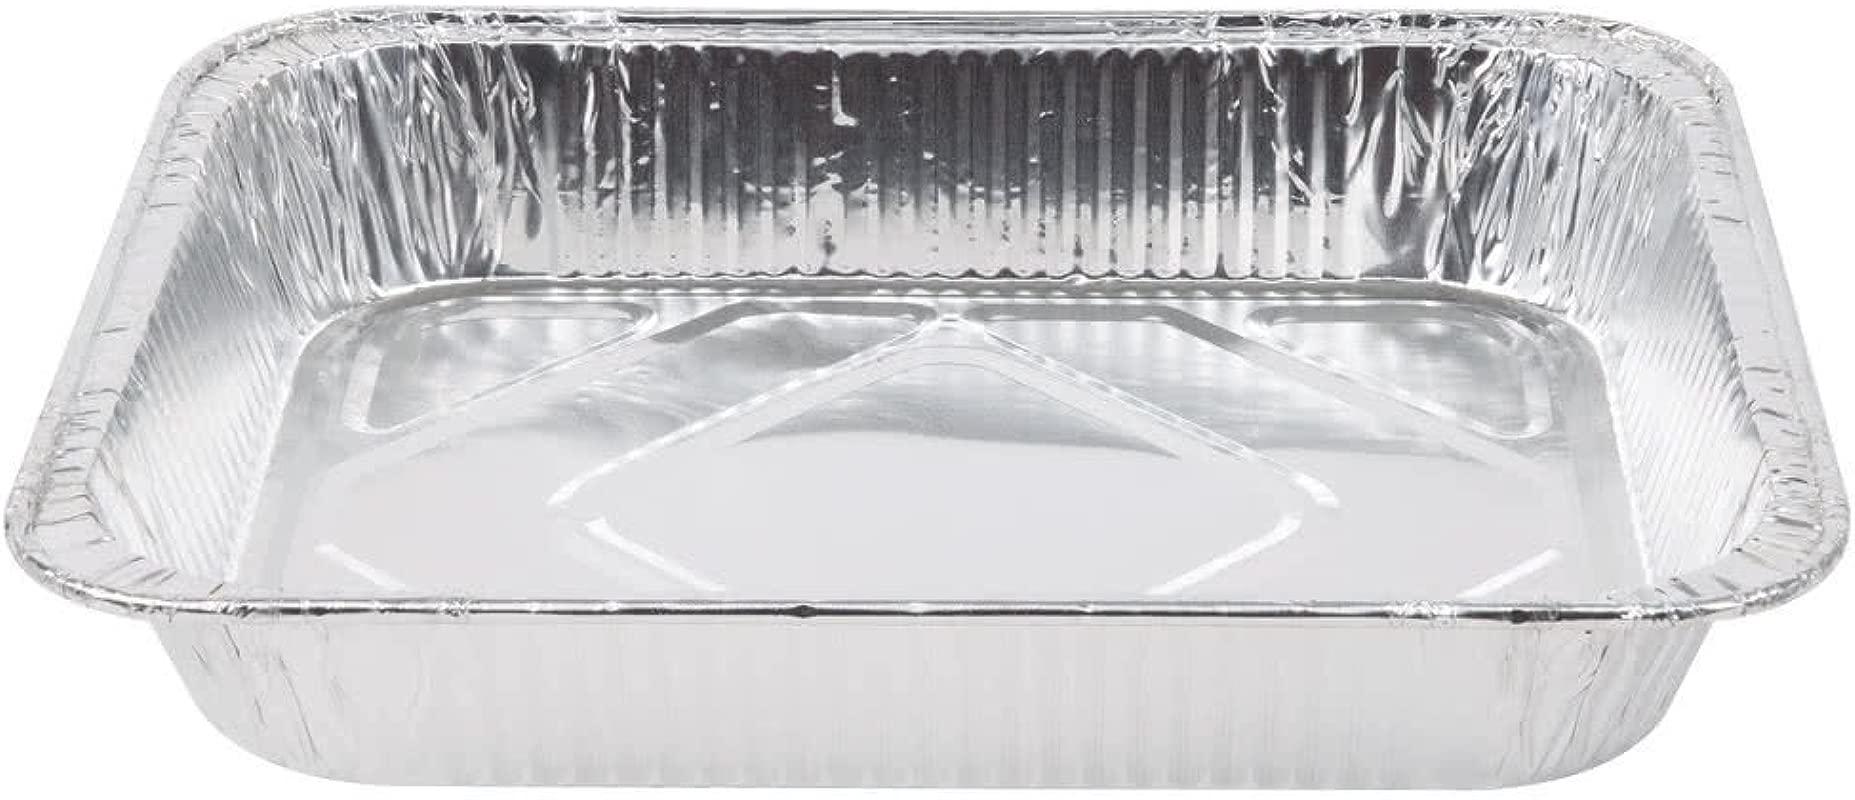 9 X 13 Half Size Heavy Duty Disposable Aluminum Steam Table Pans 5